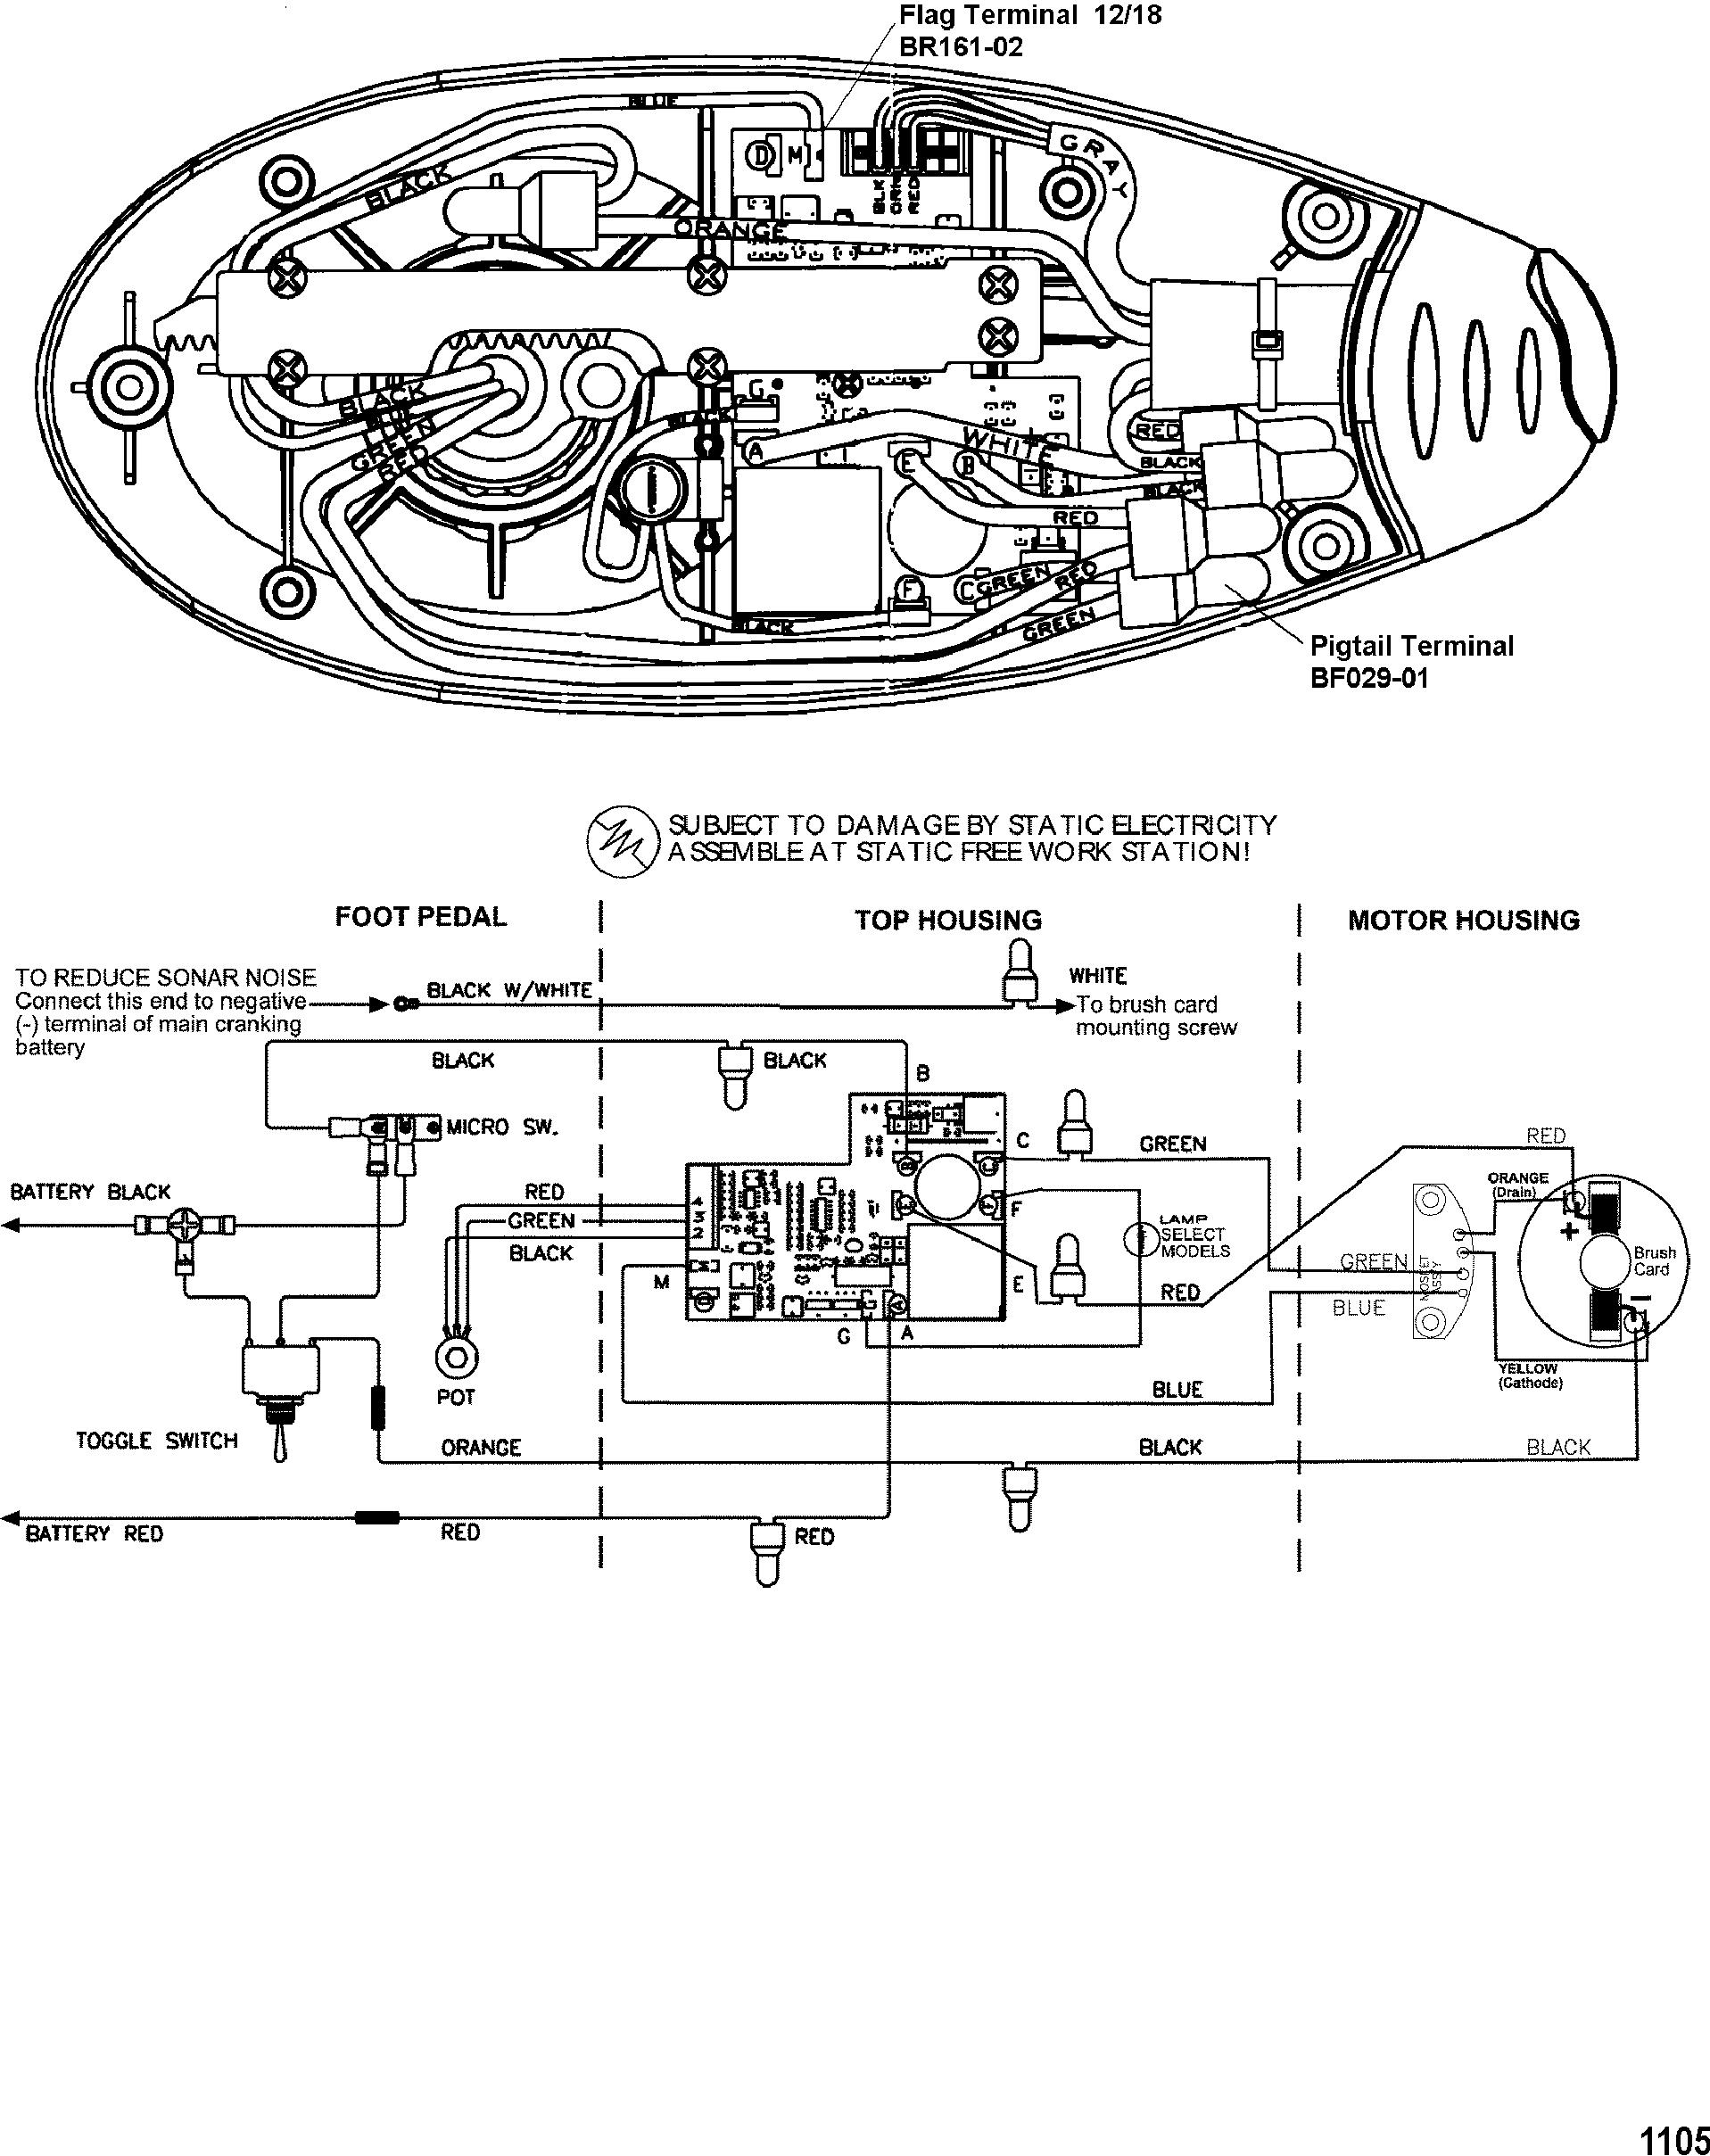 motorguide varimax wiring diagram